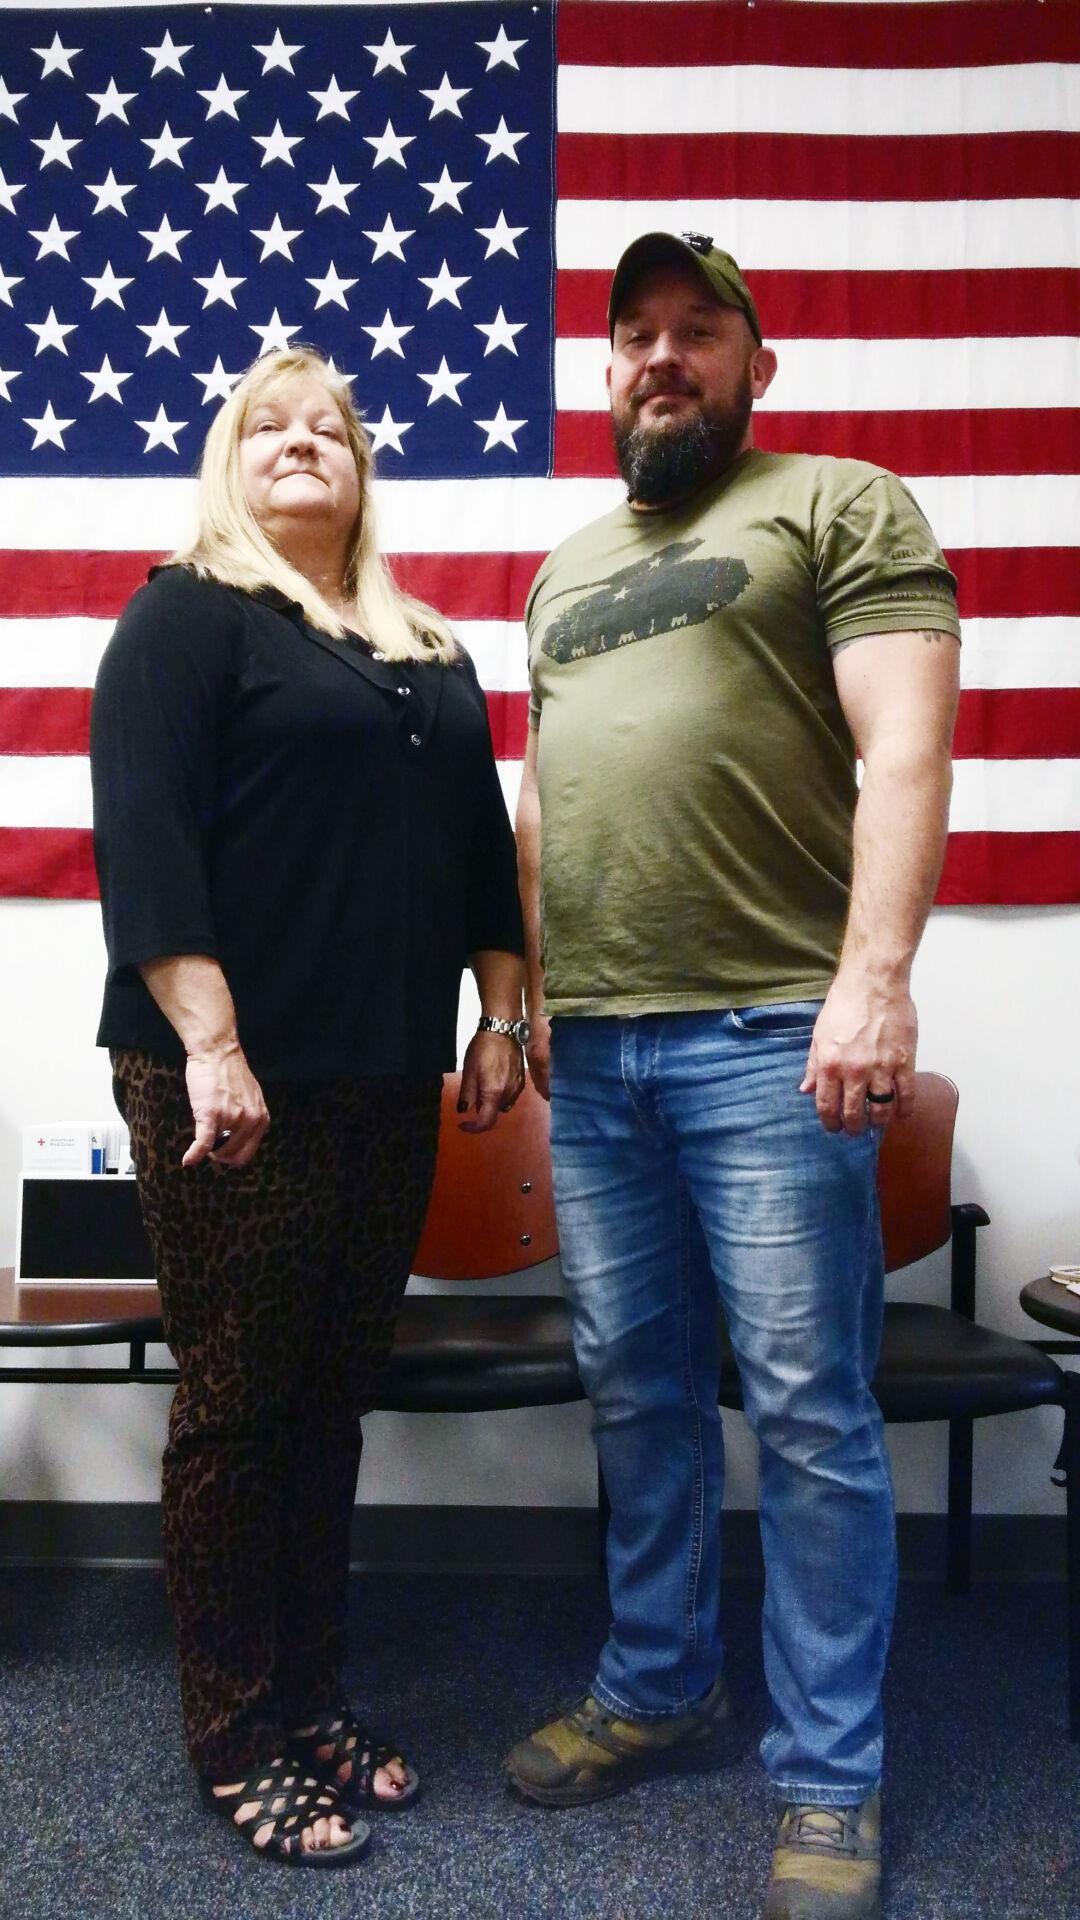 Veterans service office